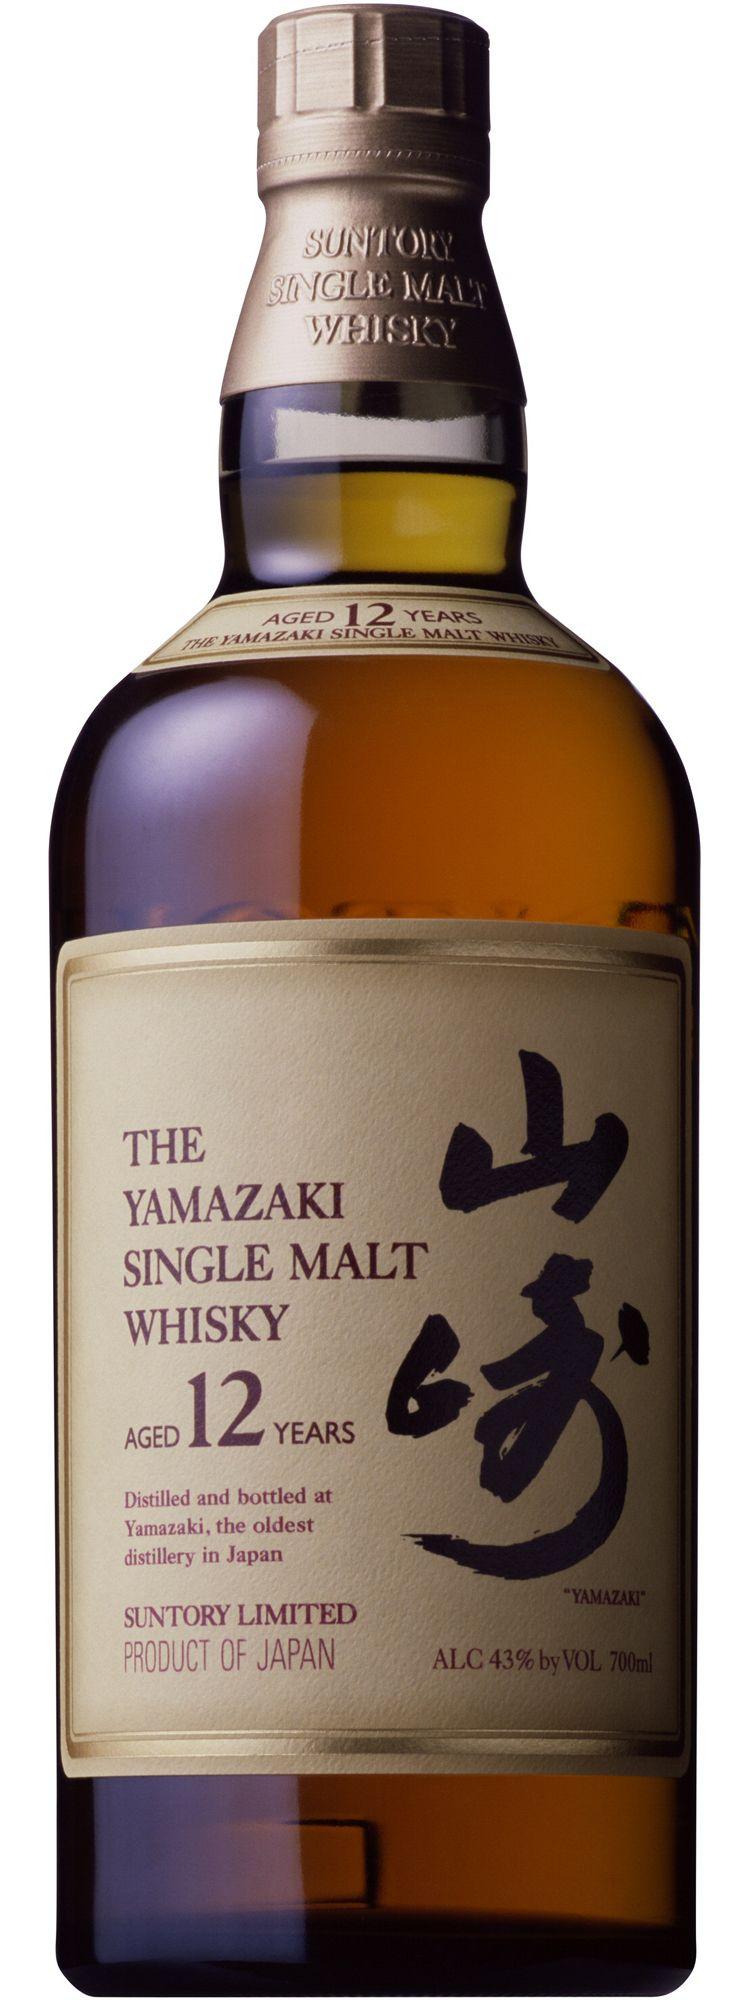 Suntory The Yamazaki Single Malt Whisky Sherry Cask 2016 Edition 70cl Whisky Malt Whisky Single Malt